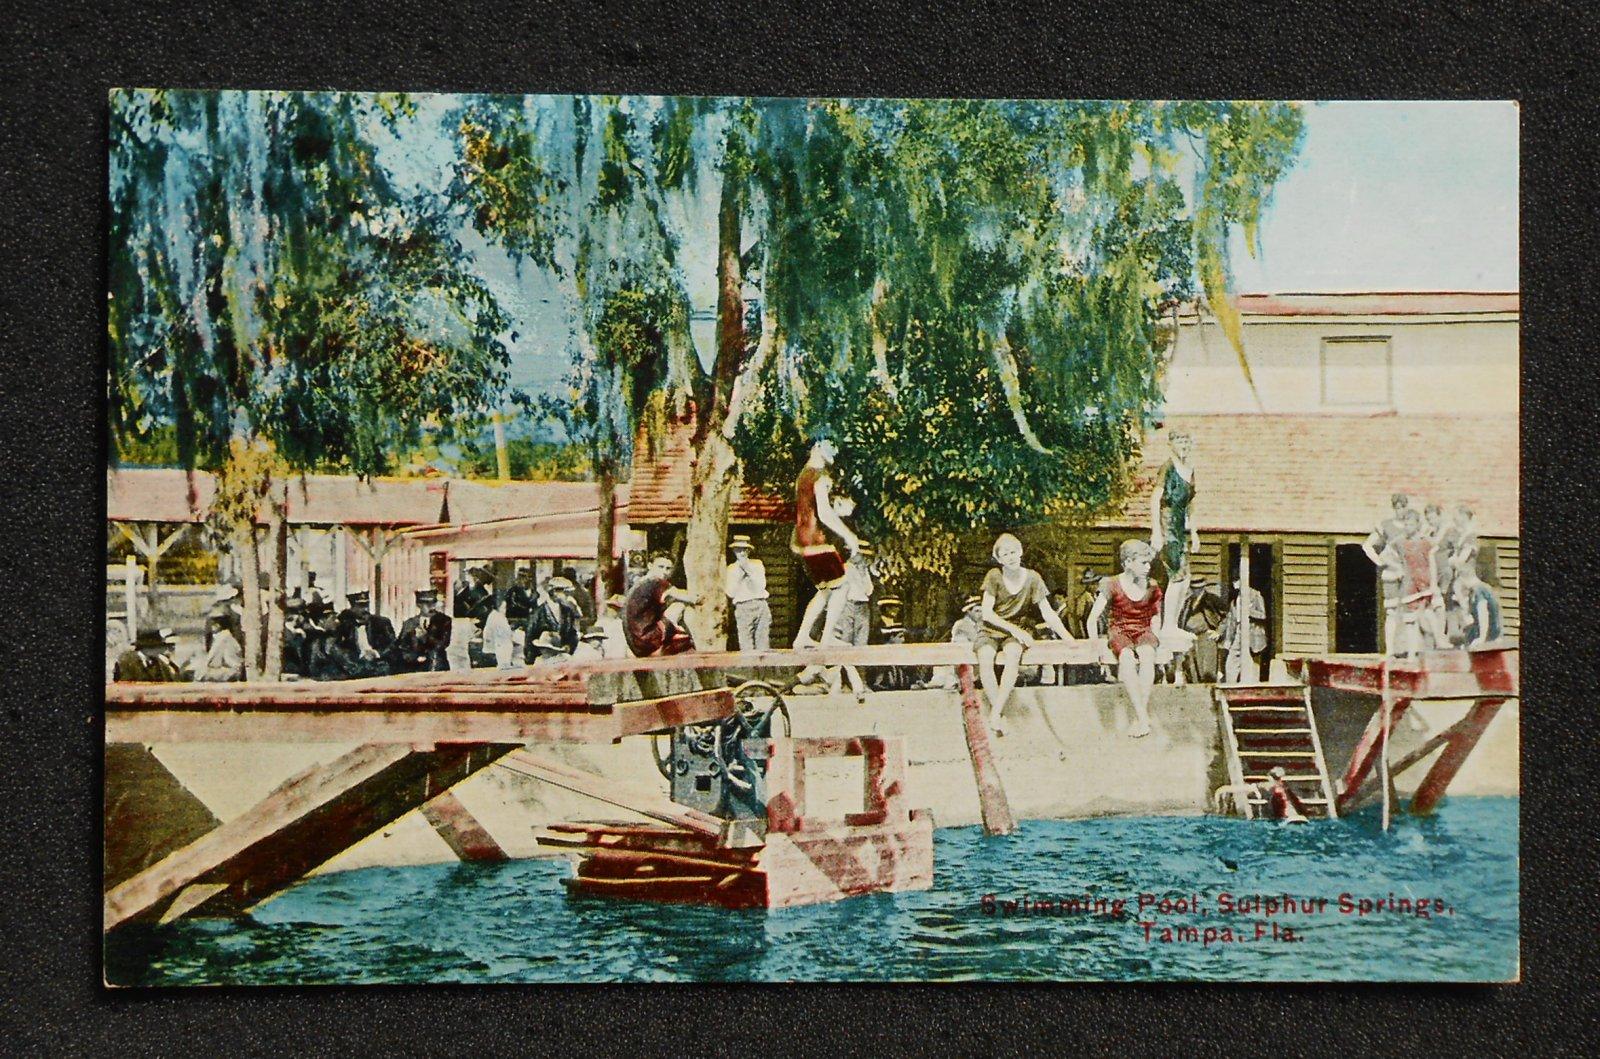 1900s swimming pool sulphur springs tampa fl hillsborough co postcard florida ebay for Hillsborough swimming pool prices